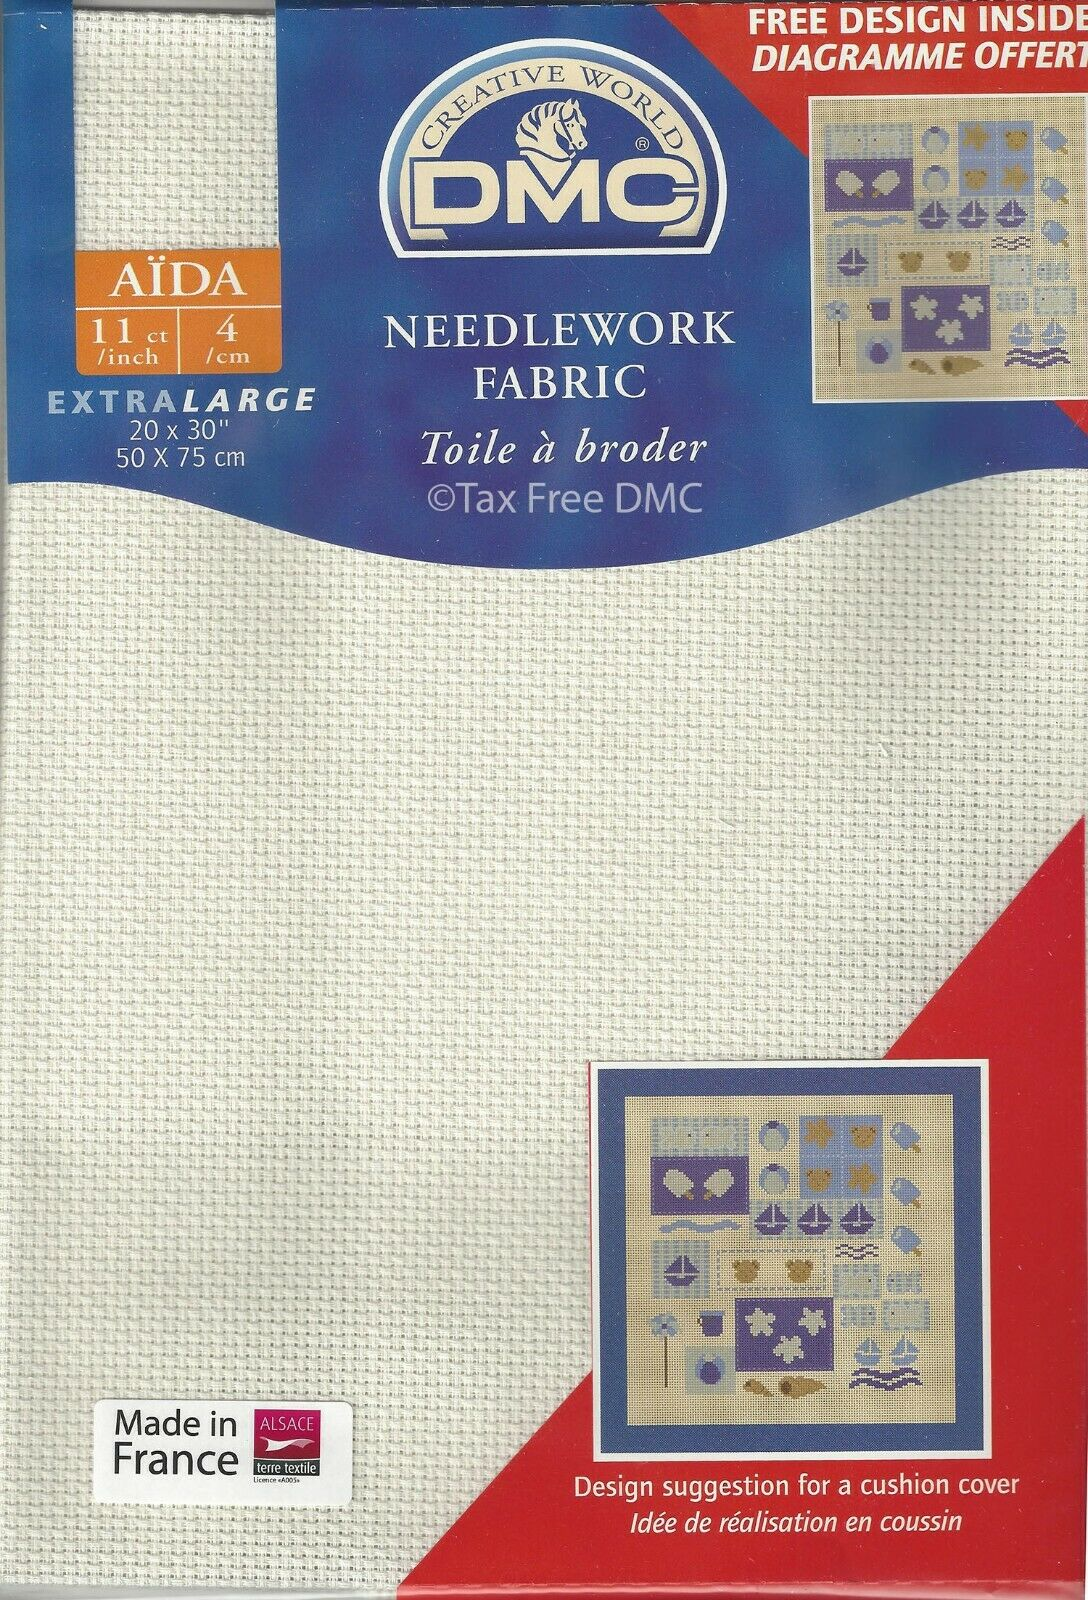 RTO prepacked Aida Cross stitch fabric BEIGE 14 count 39cm x 45cms